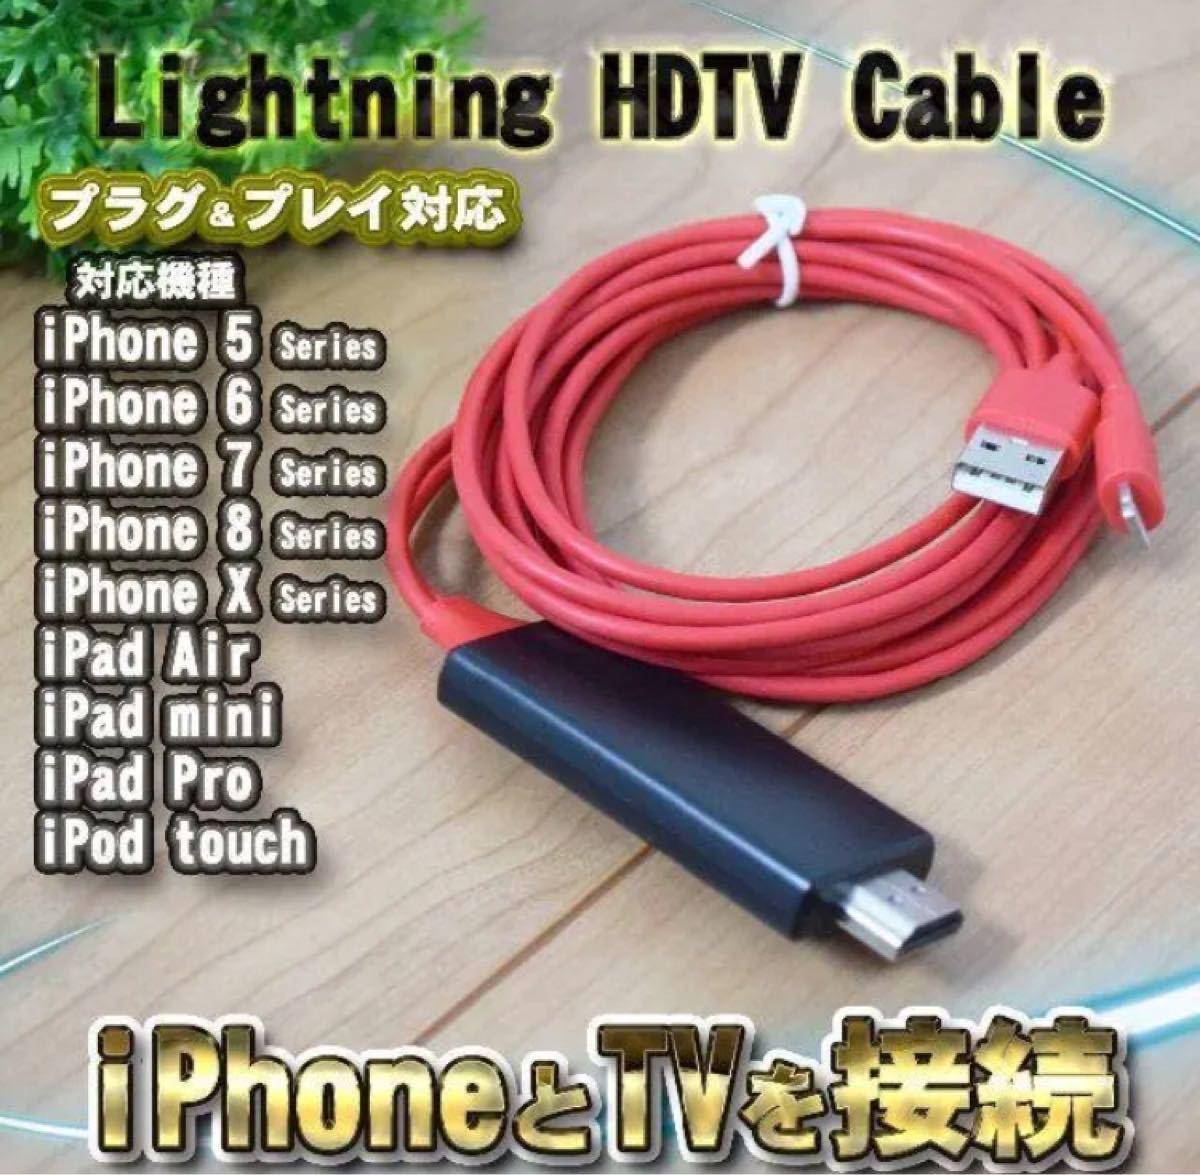 iPhone iPad HDMI 変換アダプタ 高解像度 ライトニングケーブル